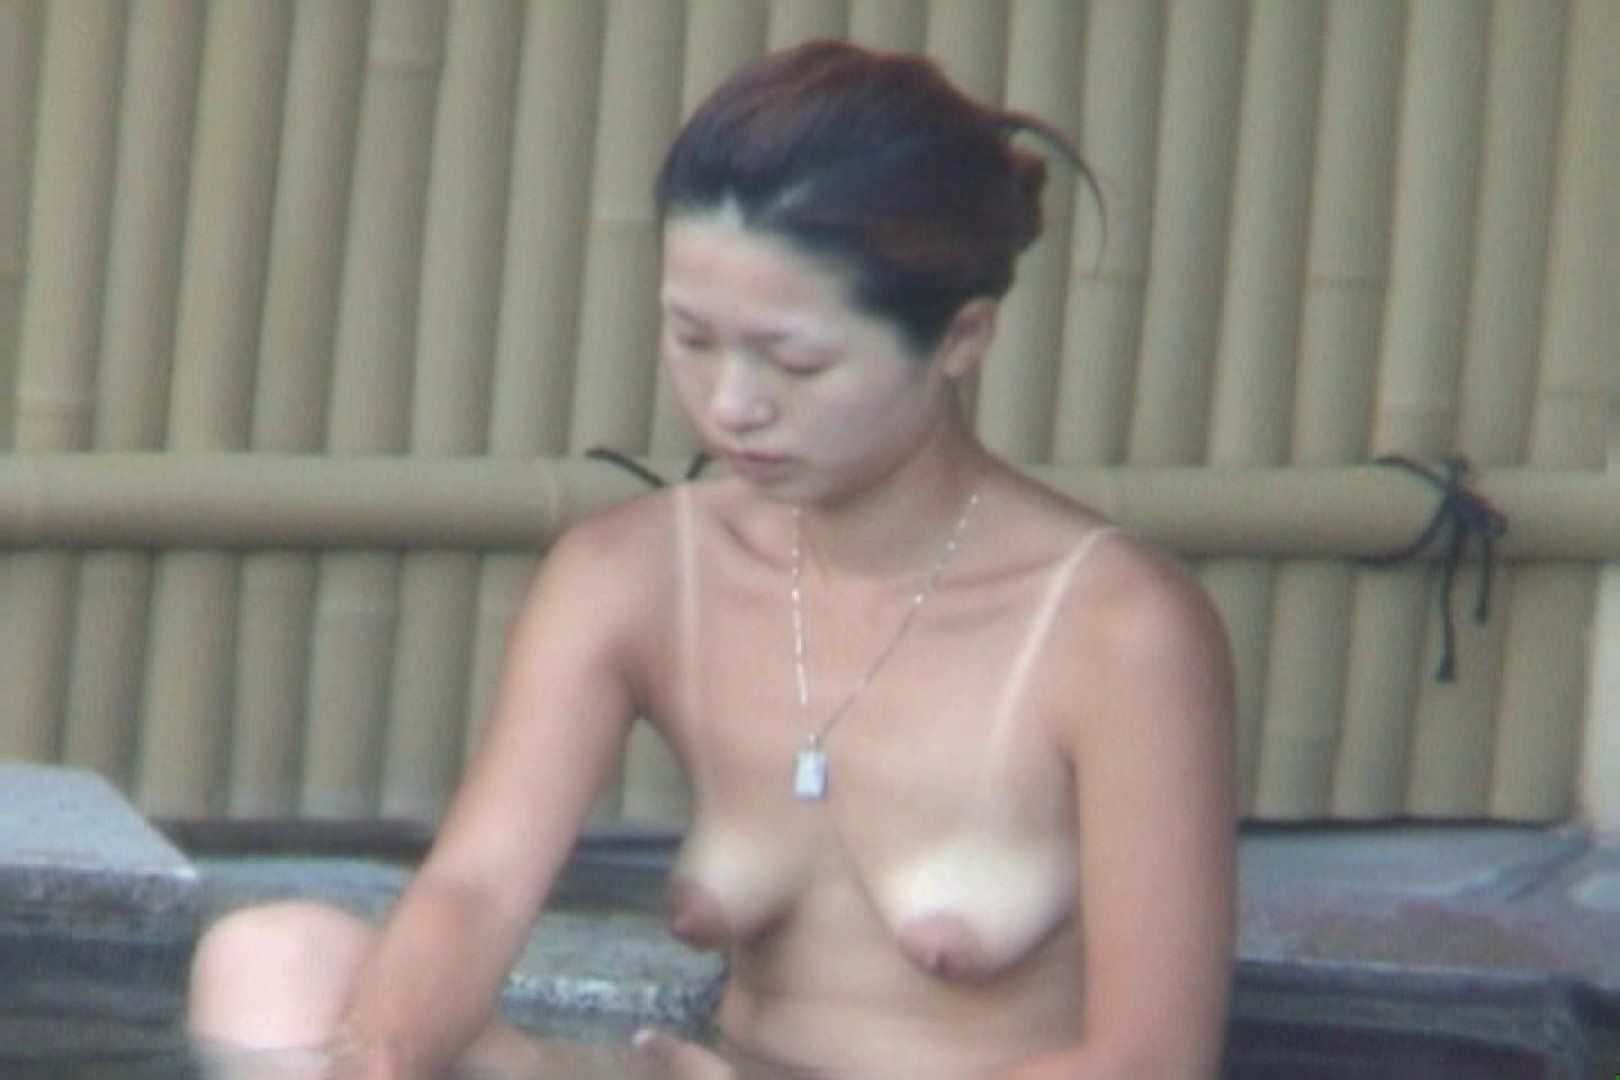 Aquaな露天風呂Vol.571 盗撮 | OLセックス  83画像 46